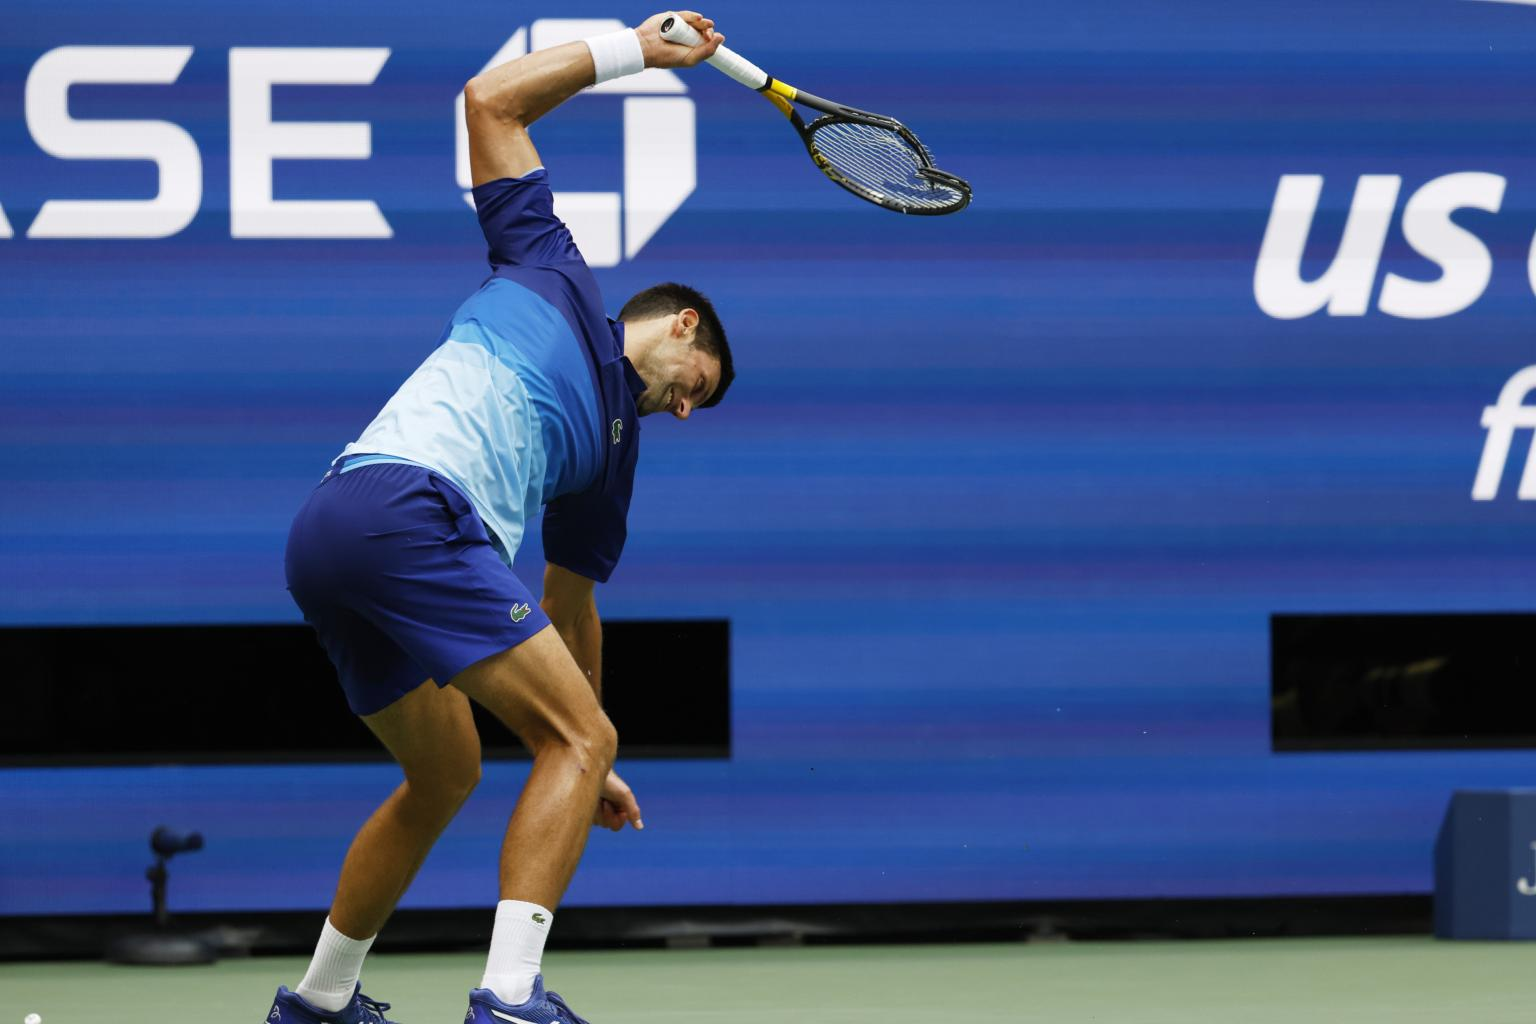 Tennis: Djokovic's Grand Slam dream foiled as Medvedev wins US Open